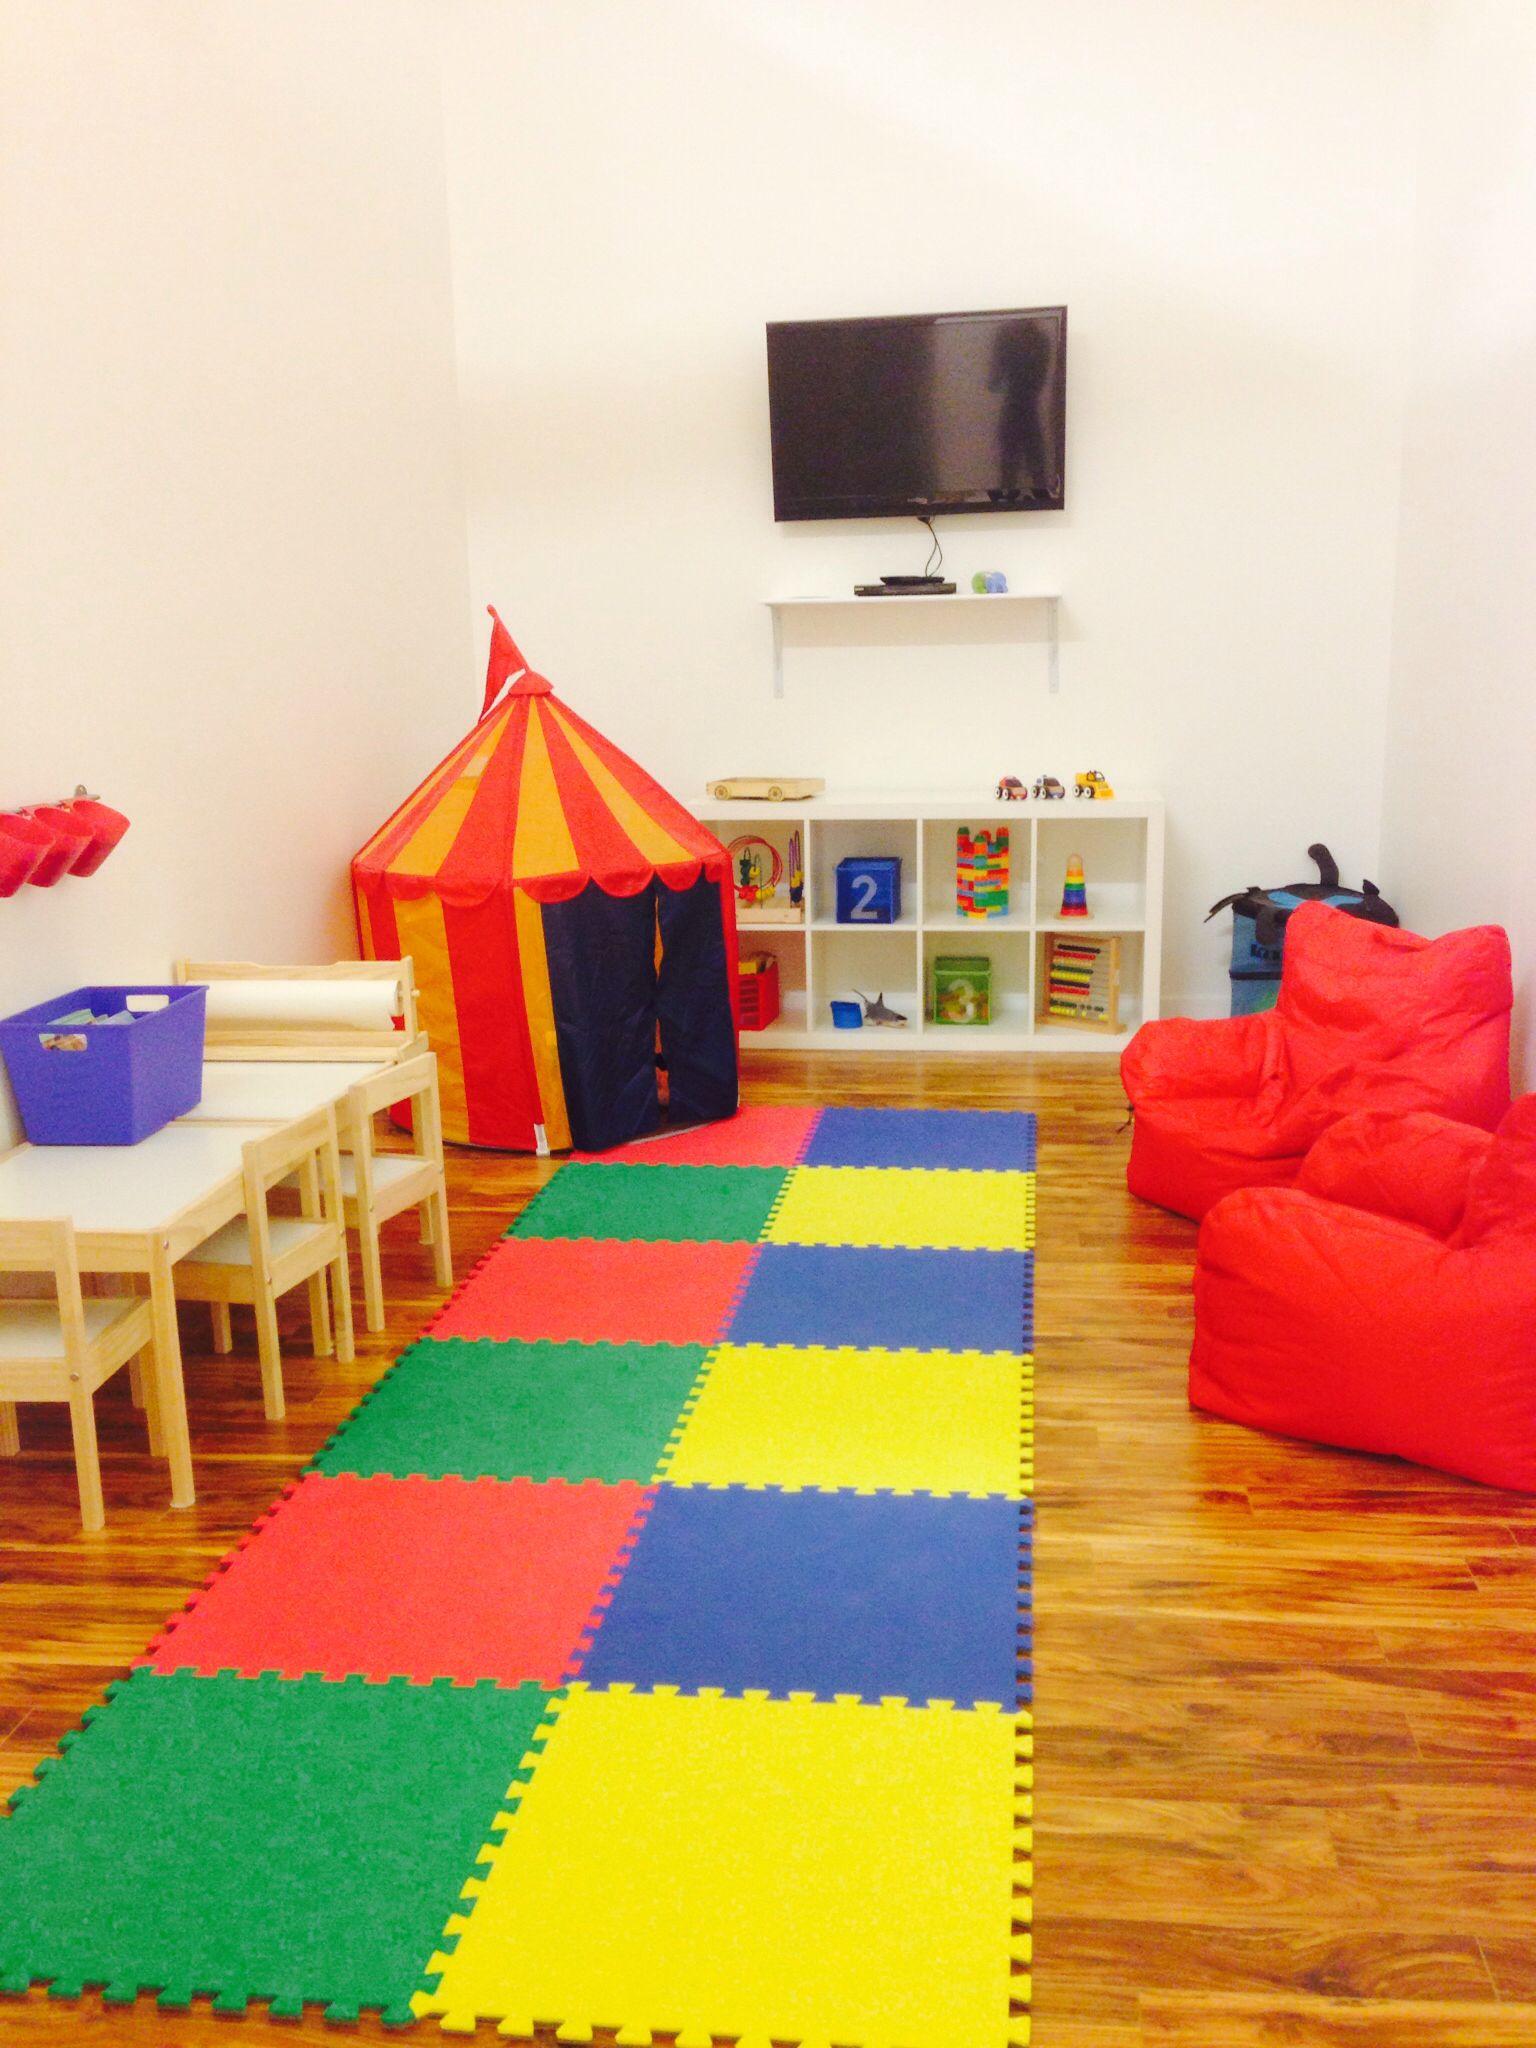 Childminders Playroom, Childminding